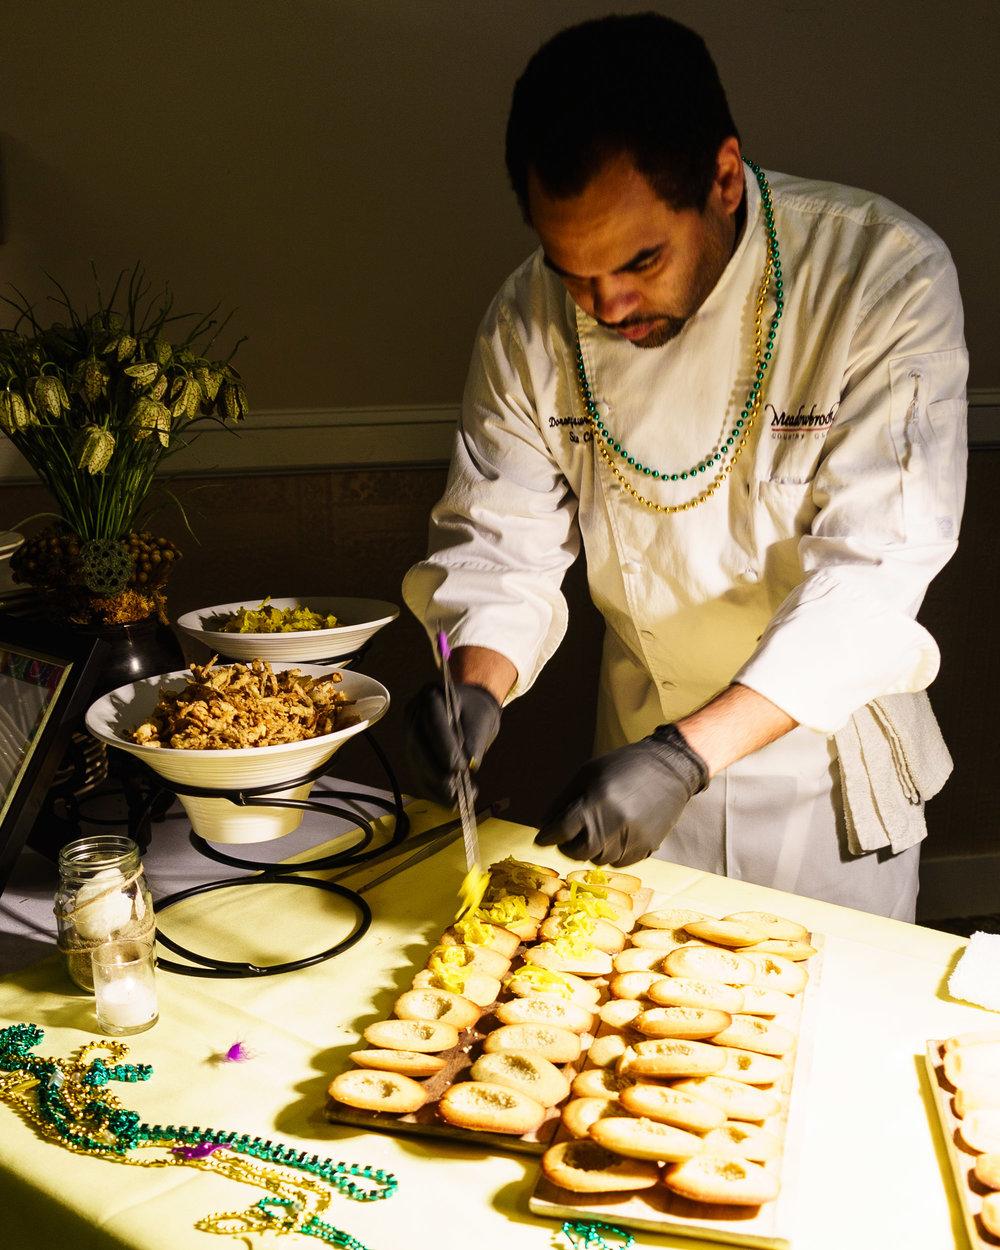 ChefsDeCuisine-Mardigras-29.jpg